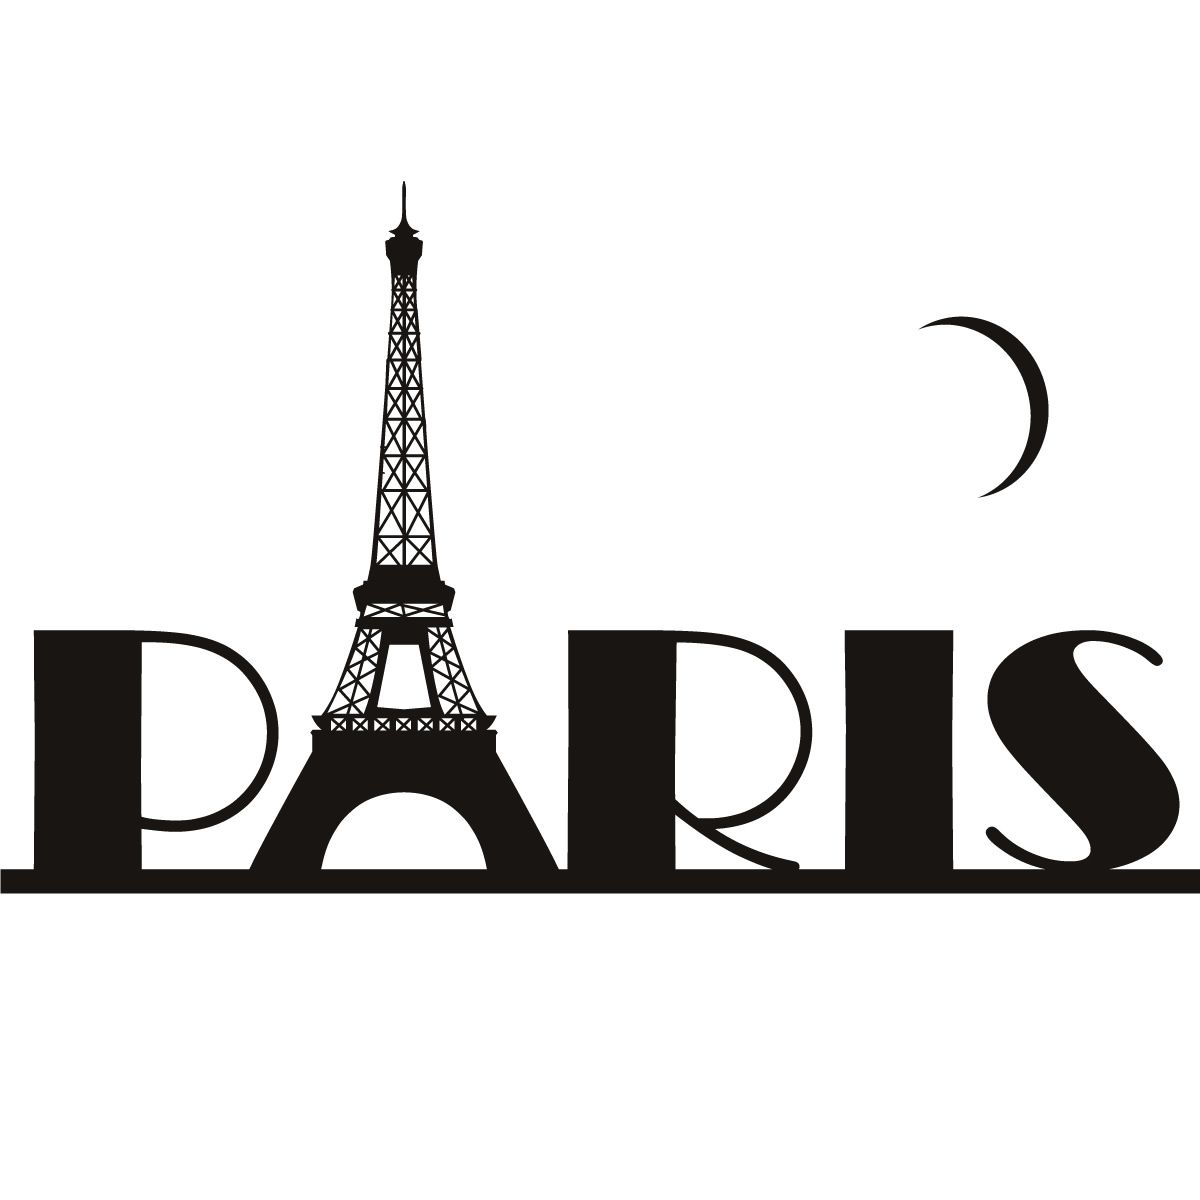 1200x1200 Paris Eiffel Tower France Wall Art Sticker Wall Decal Transfers